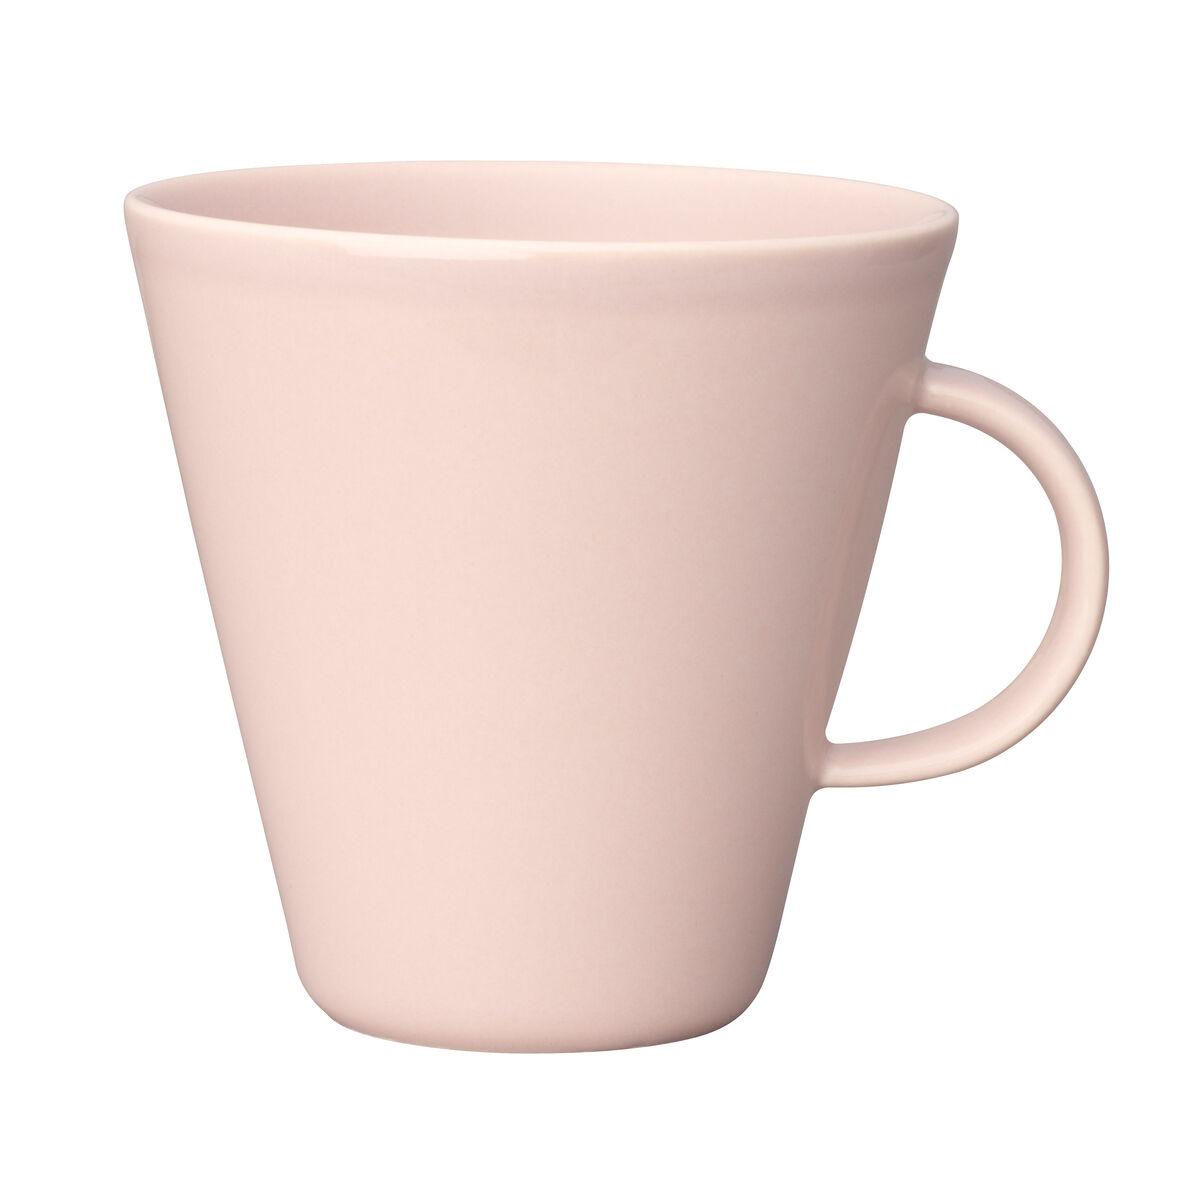 Arabia KoKo muki 0,35 L, vaalea pinkki